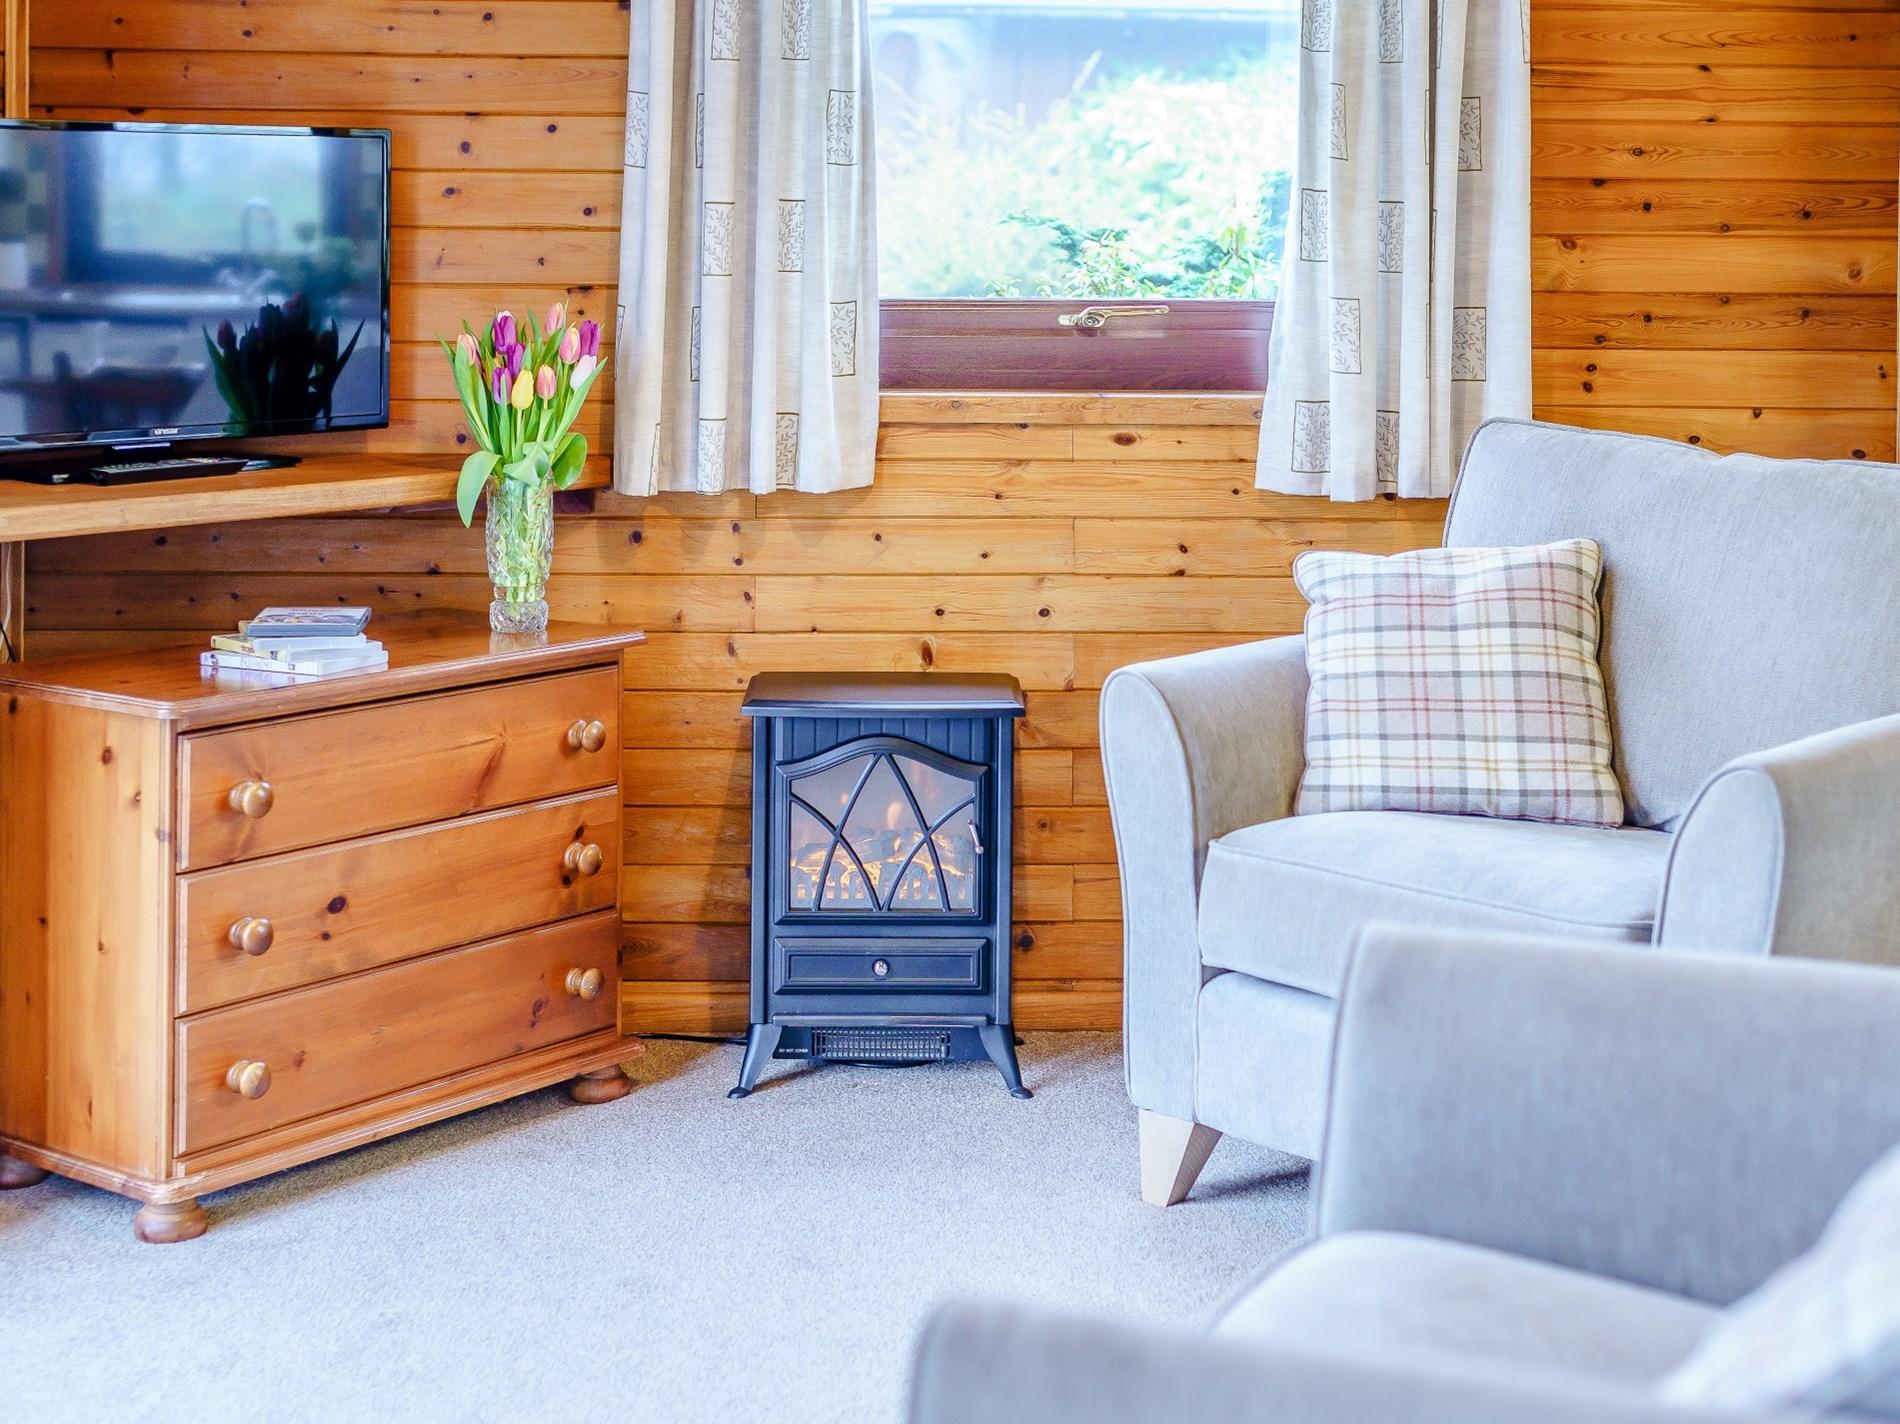 2 Bedroom Log Cabin in North Cornwall, Cornwall